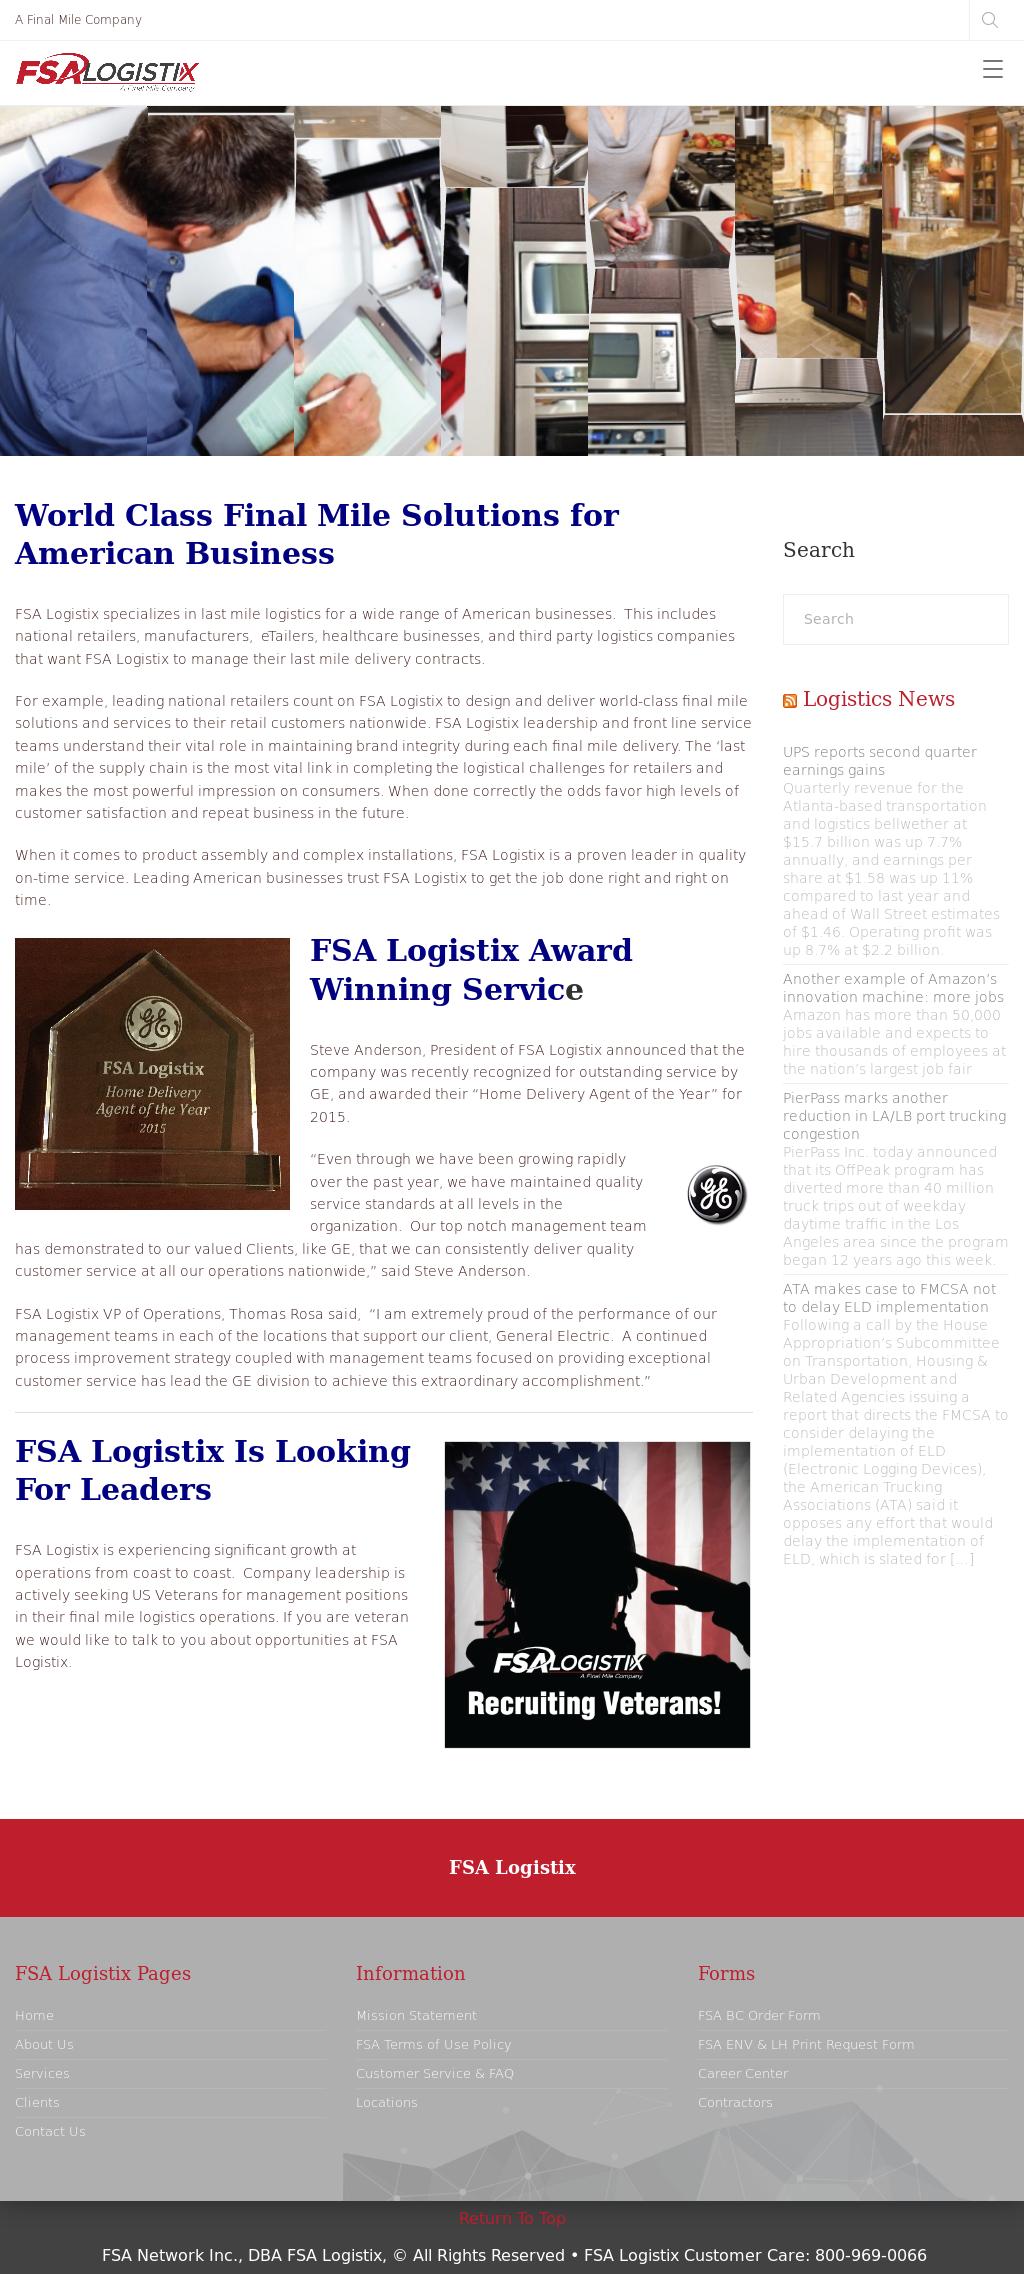 FSA Logistix Competitors, Revenue and Employees - Owler